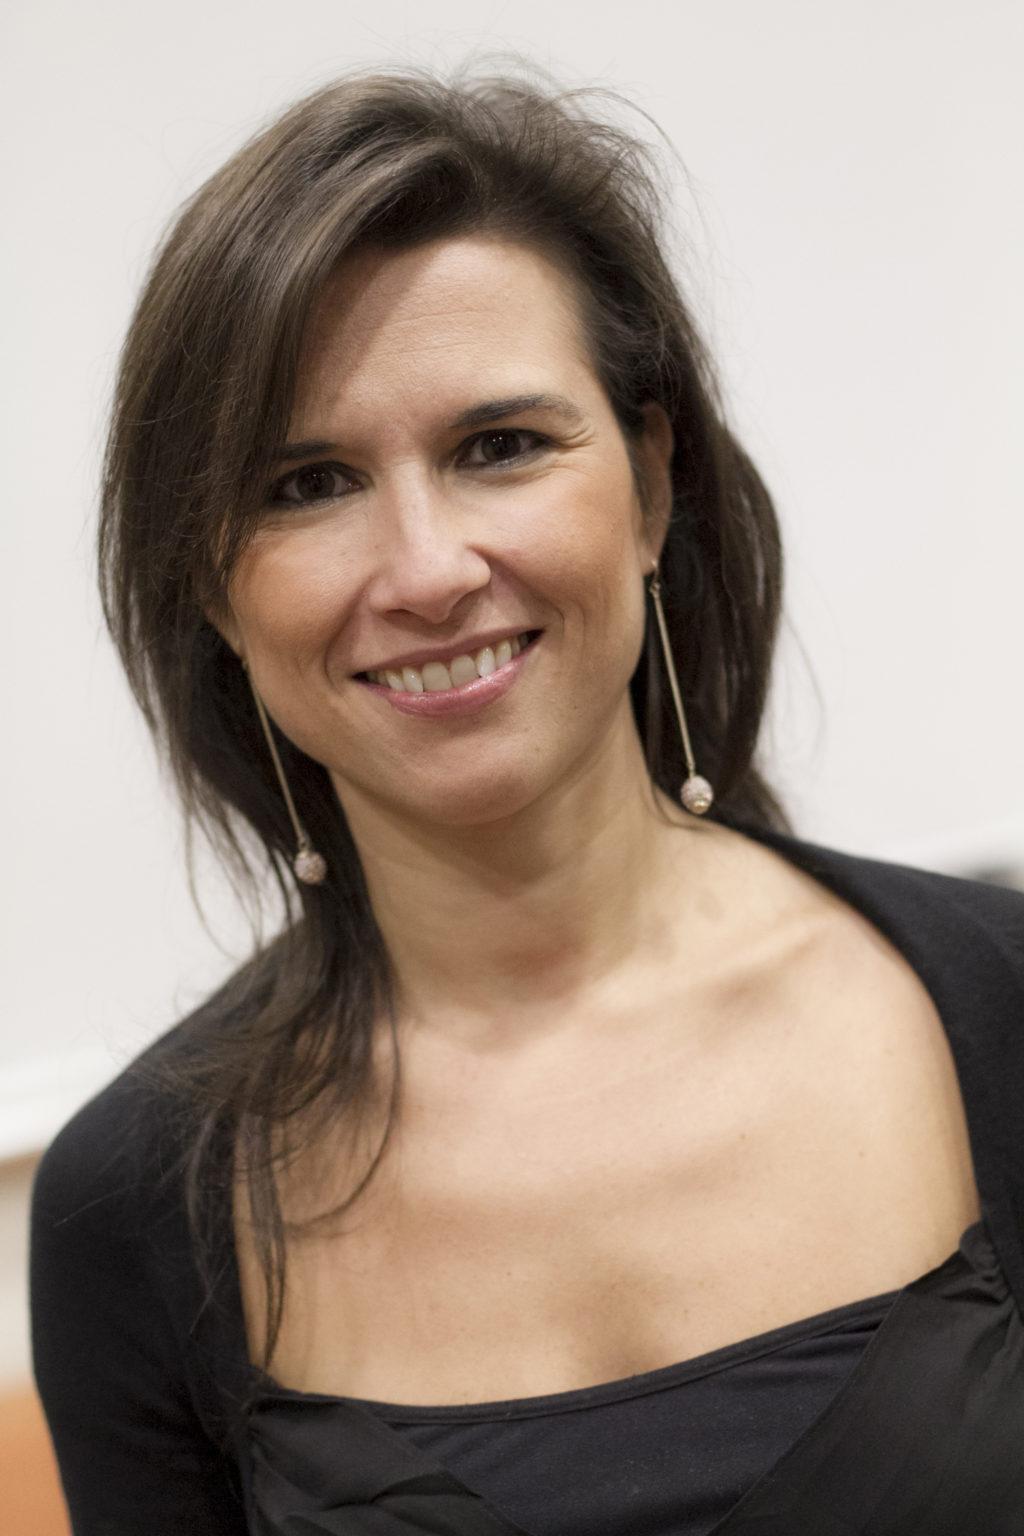 Maria Cristina Bifulco